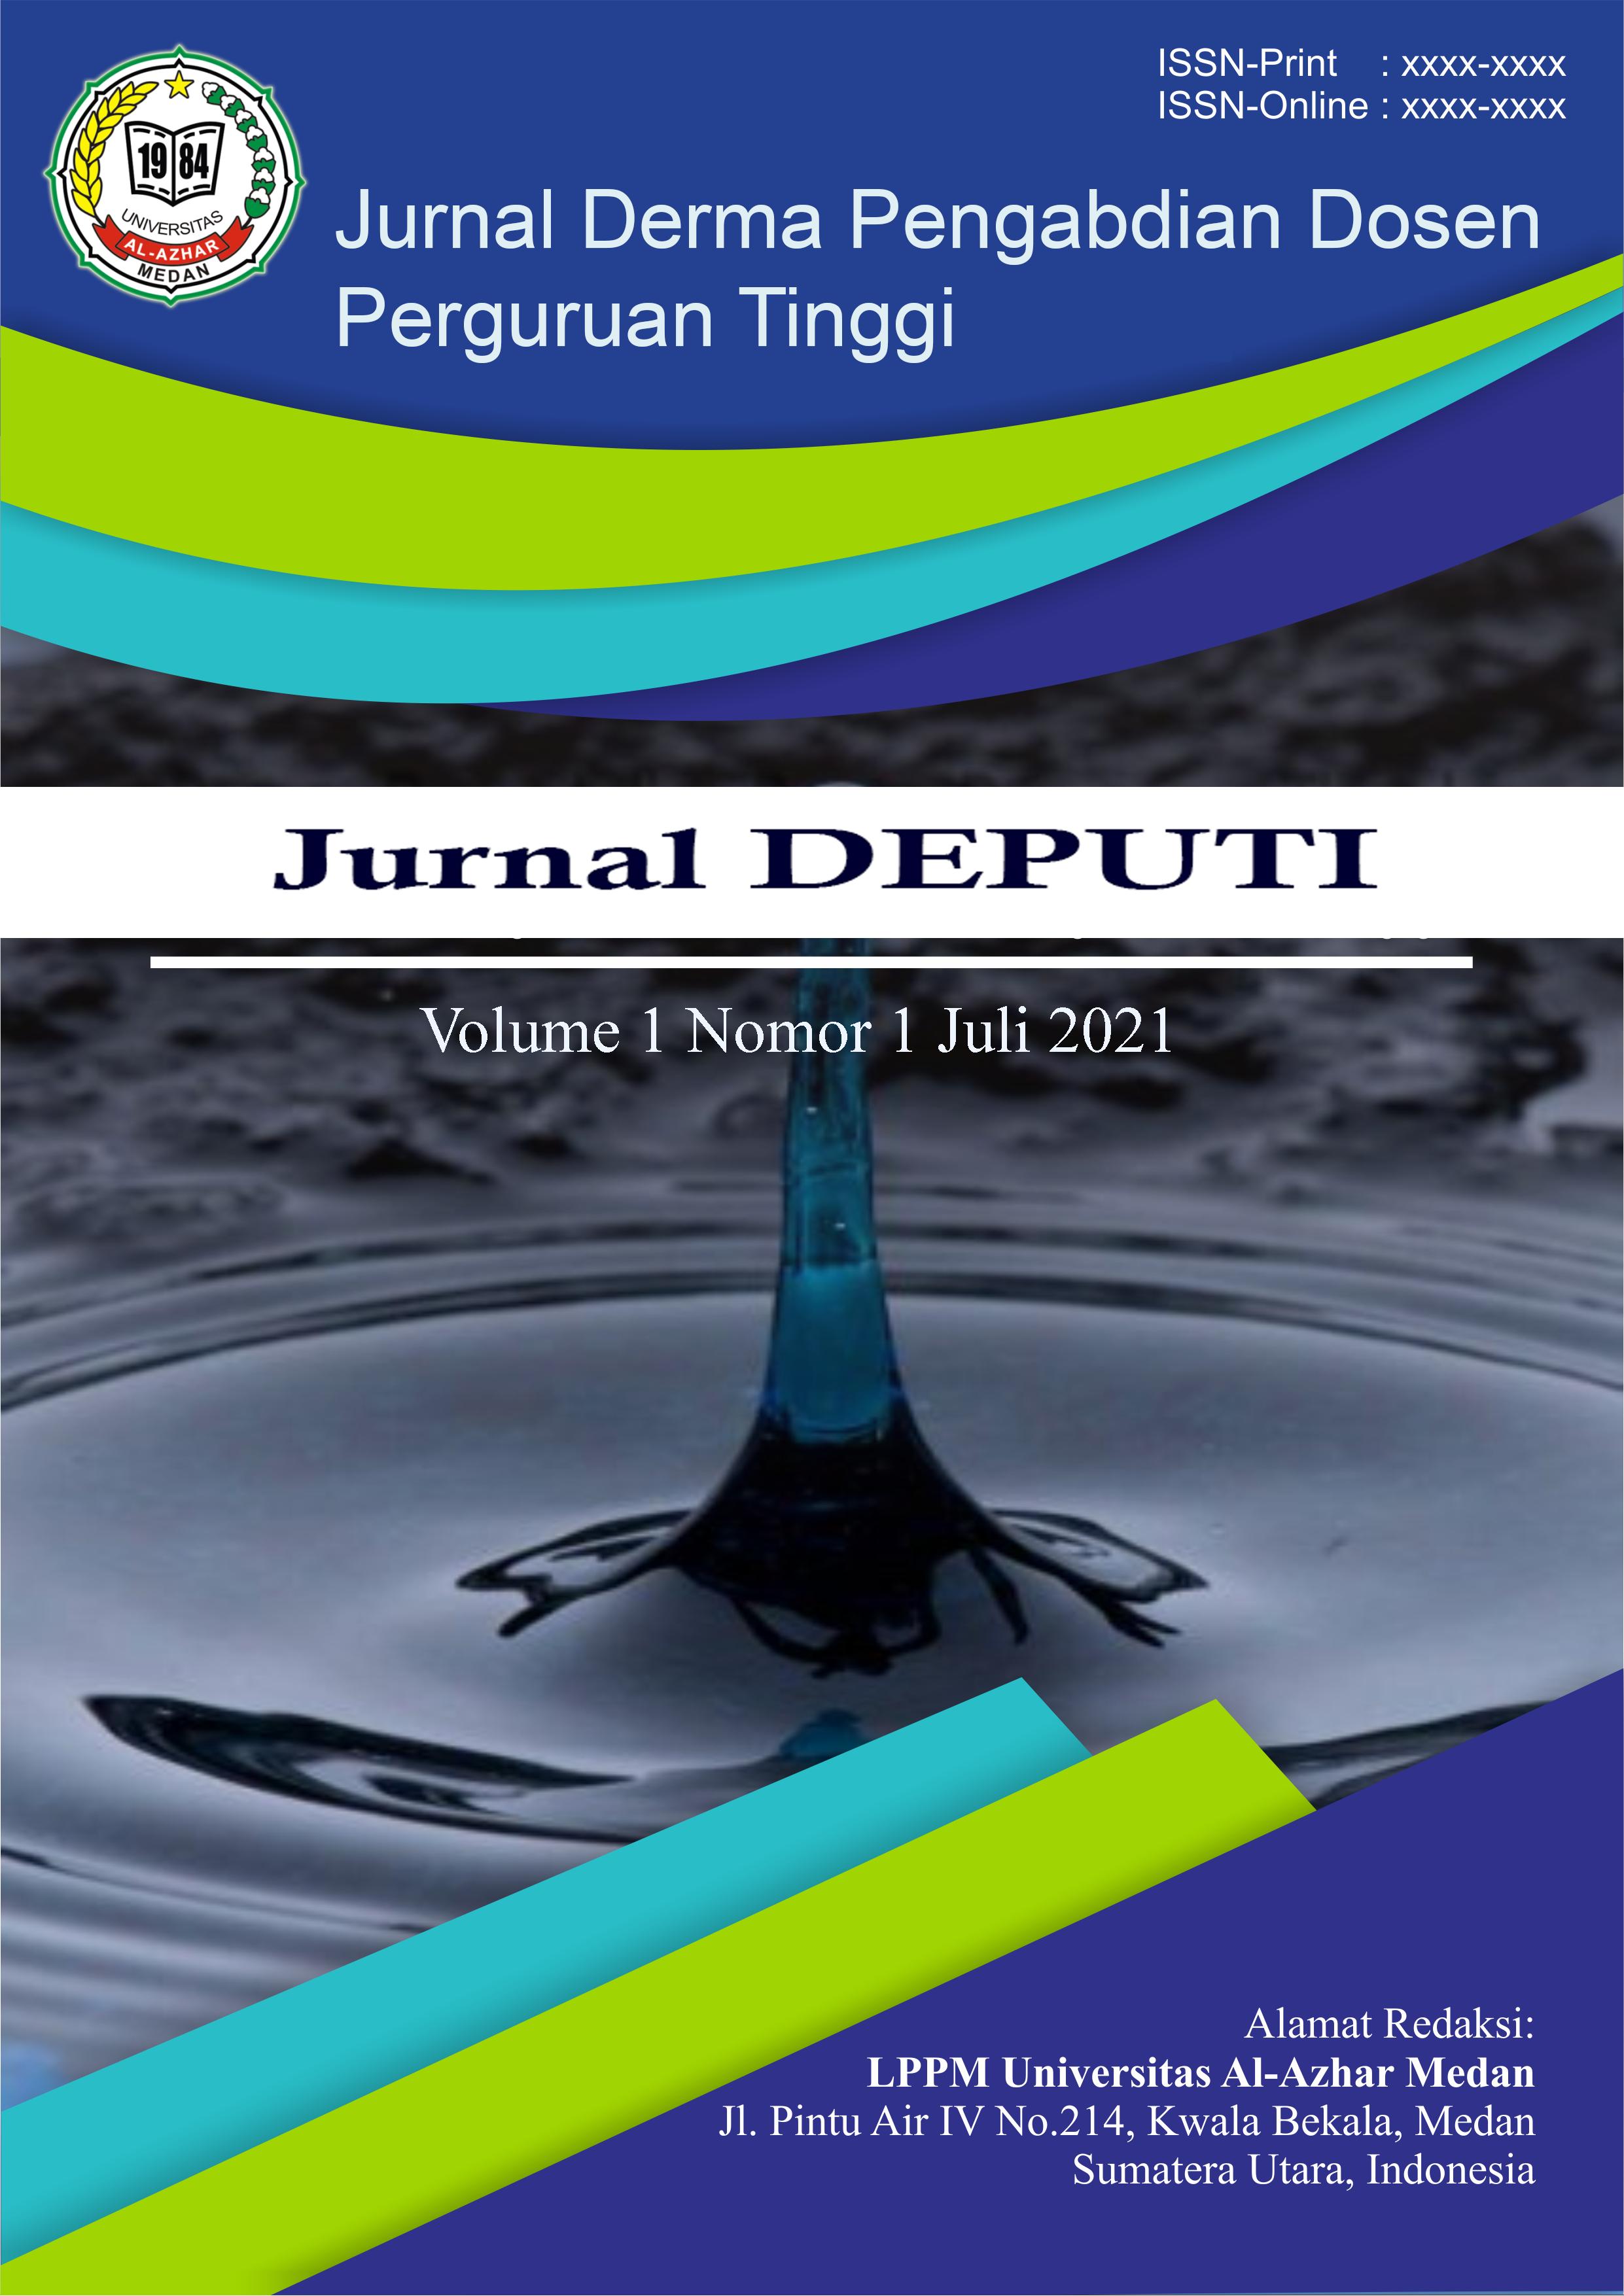 View Vol. 1 No. 1 (2021): Derma Pengabdian Dosen